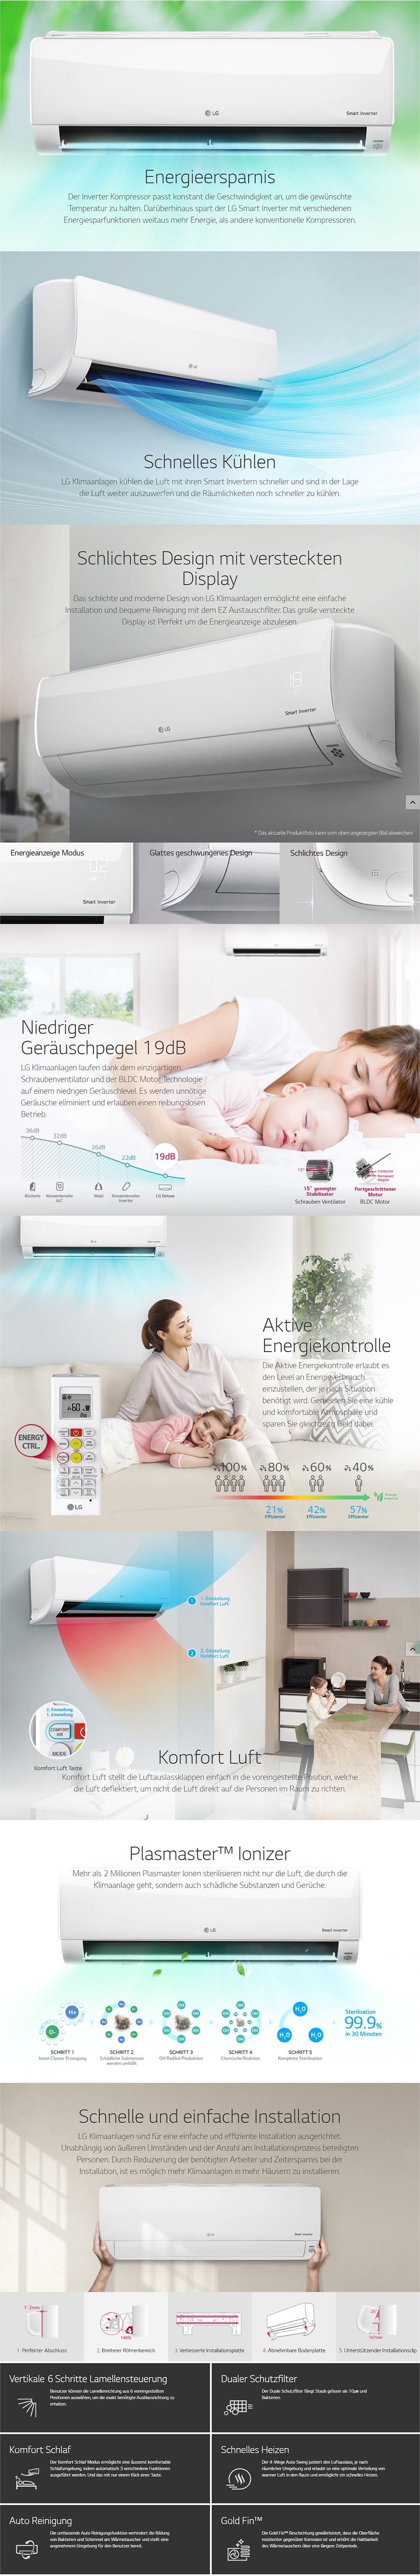 LG Standard (S09EQ) (P09EN) 2,5 kW Klimaanlage Inverter Klimagerät ...